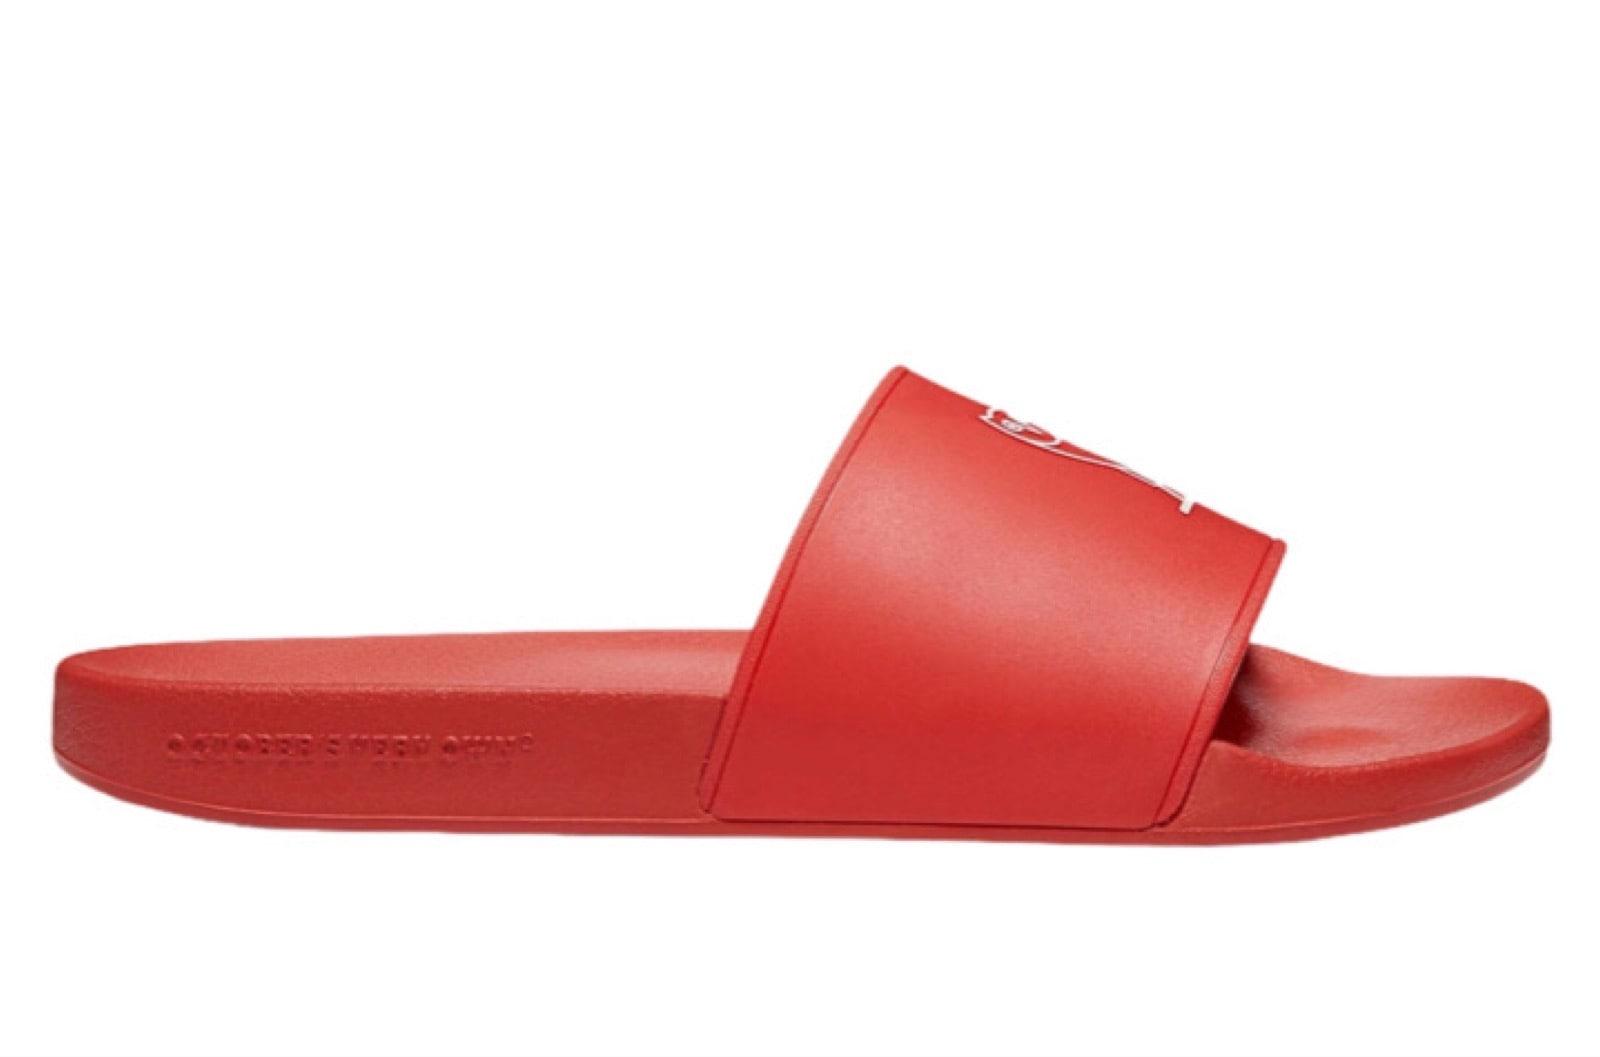 slide 1 - Owl Red Slides